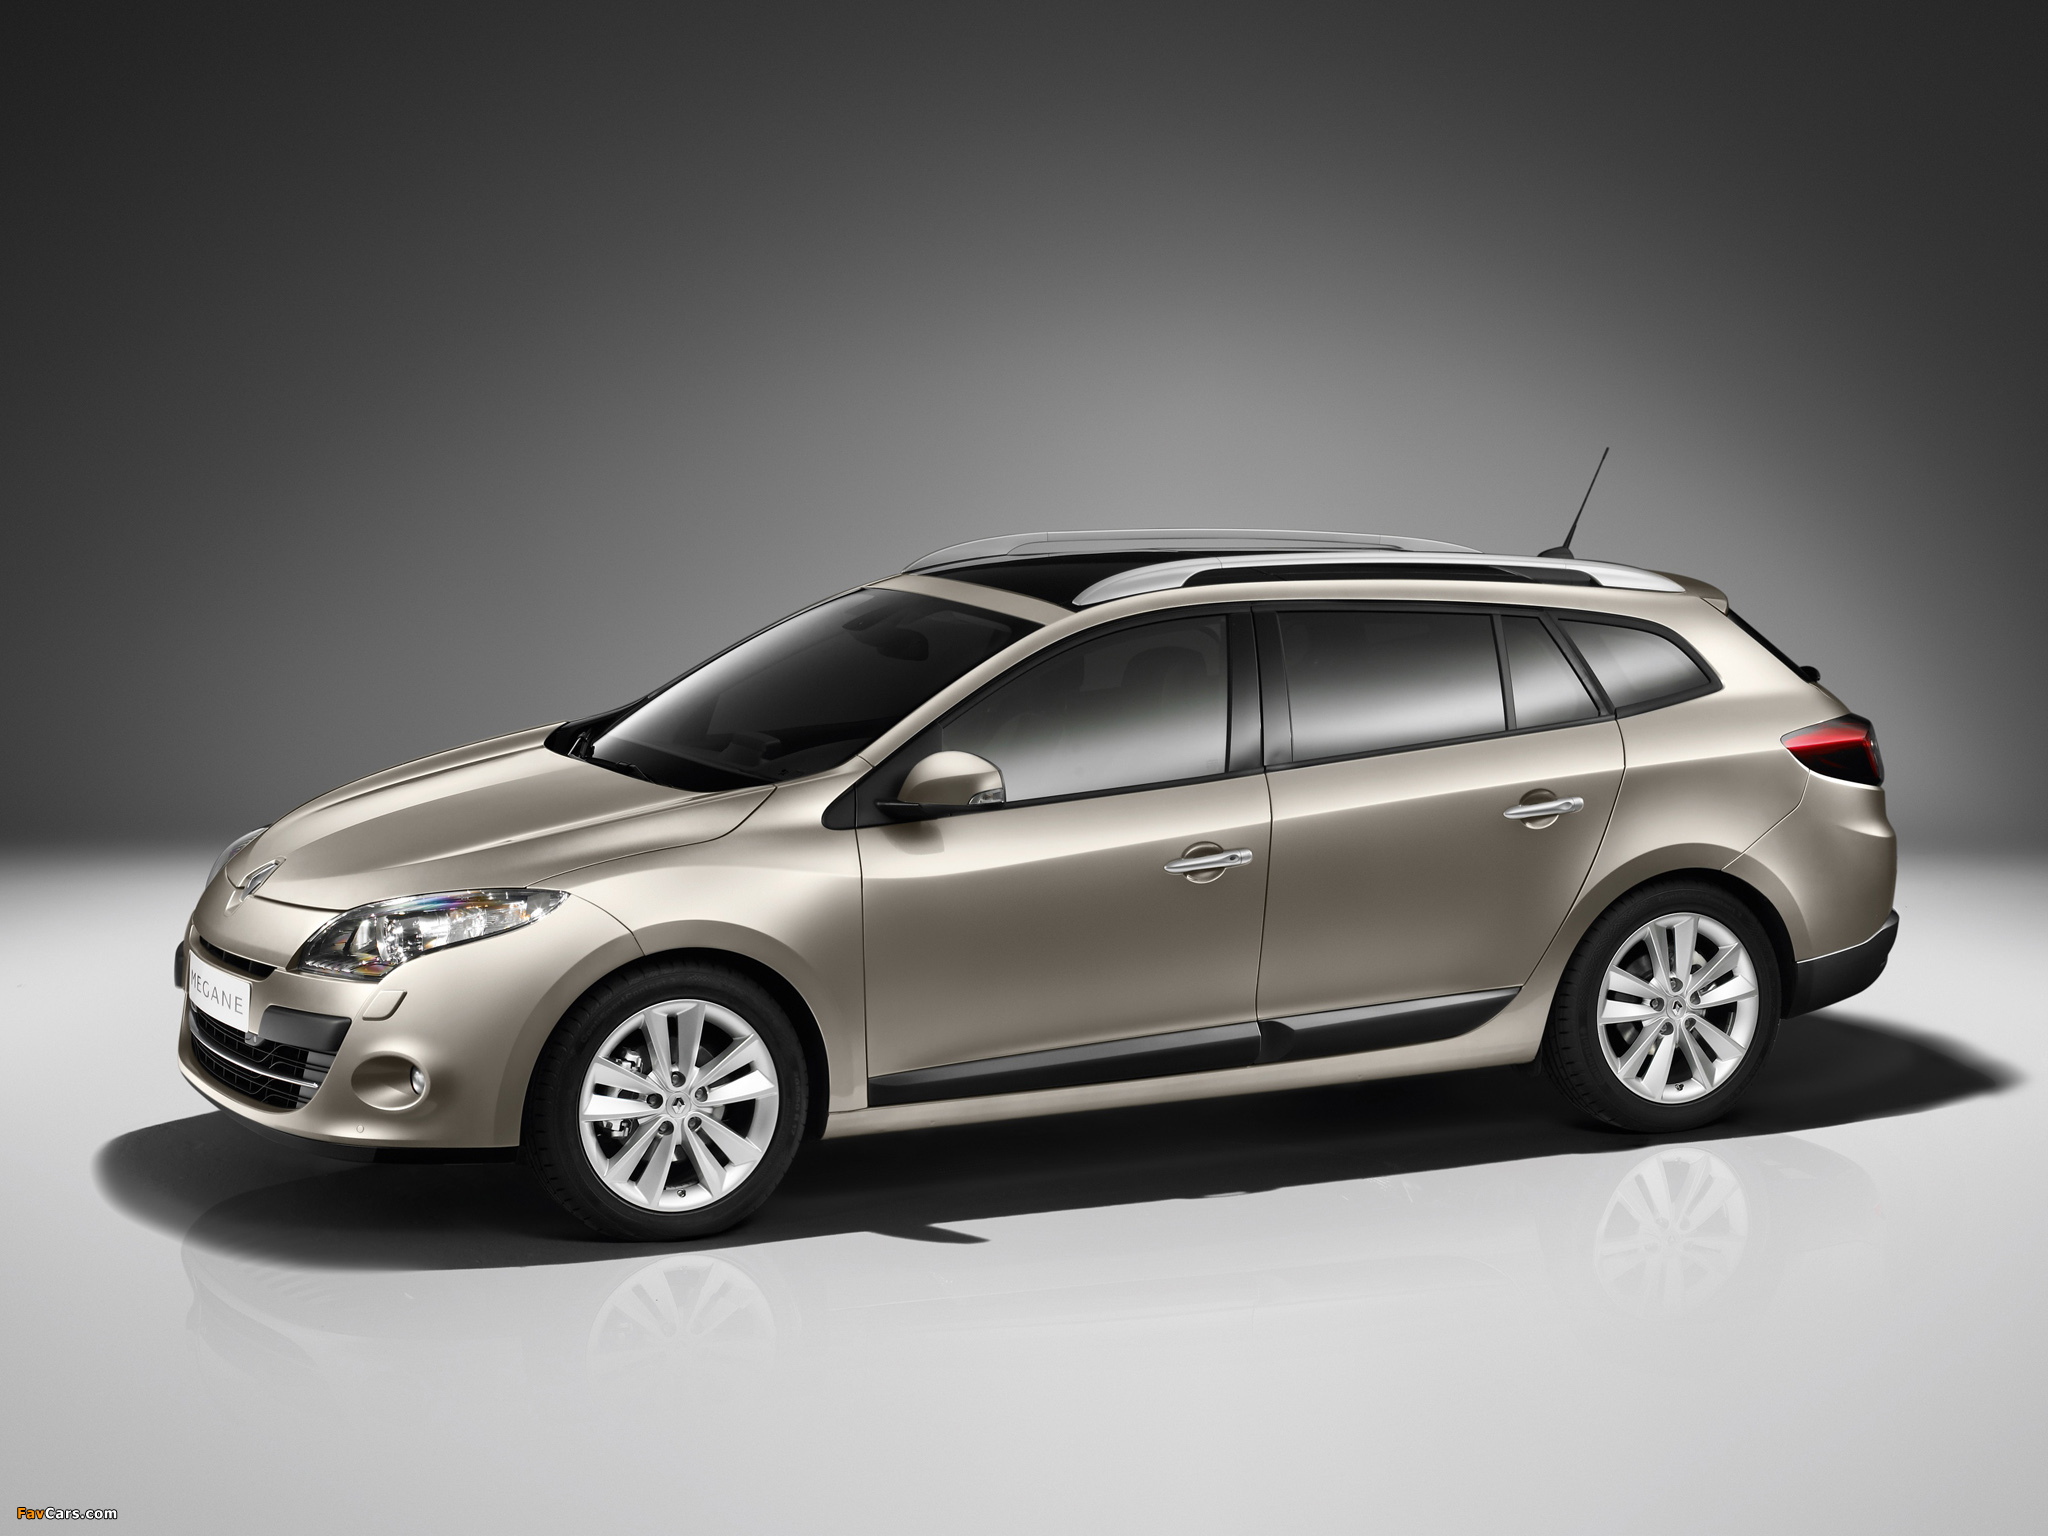 Renault Megane Grandtour 2009 images (2048 x 1536)